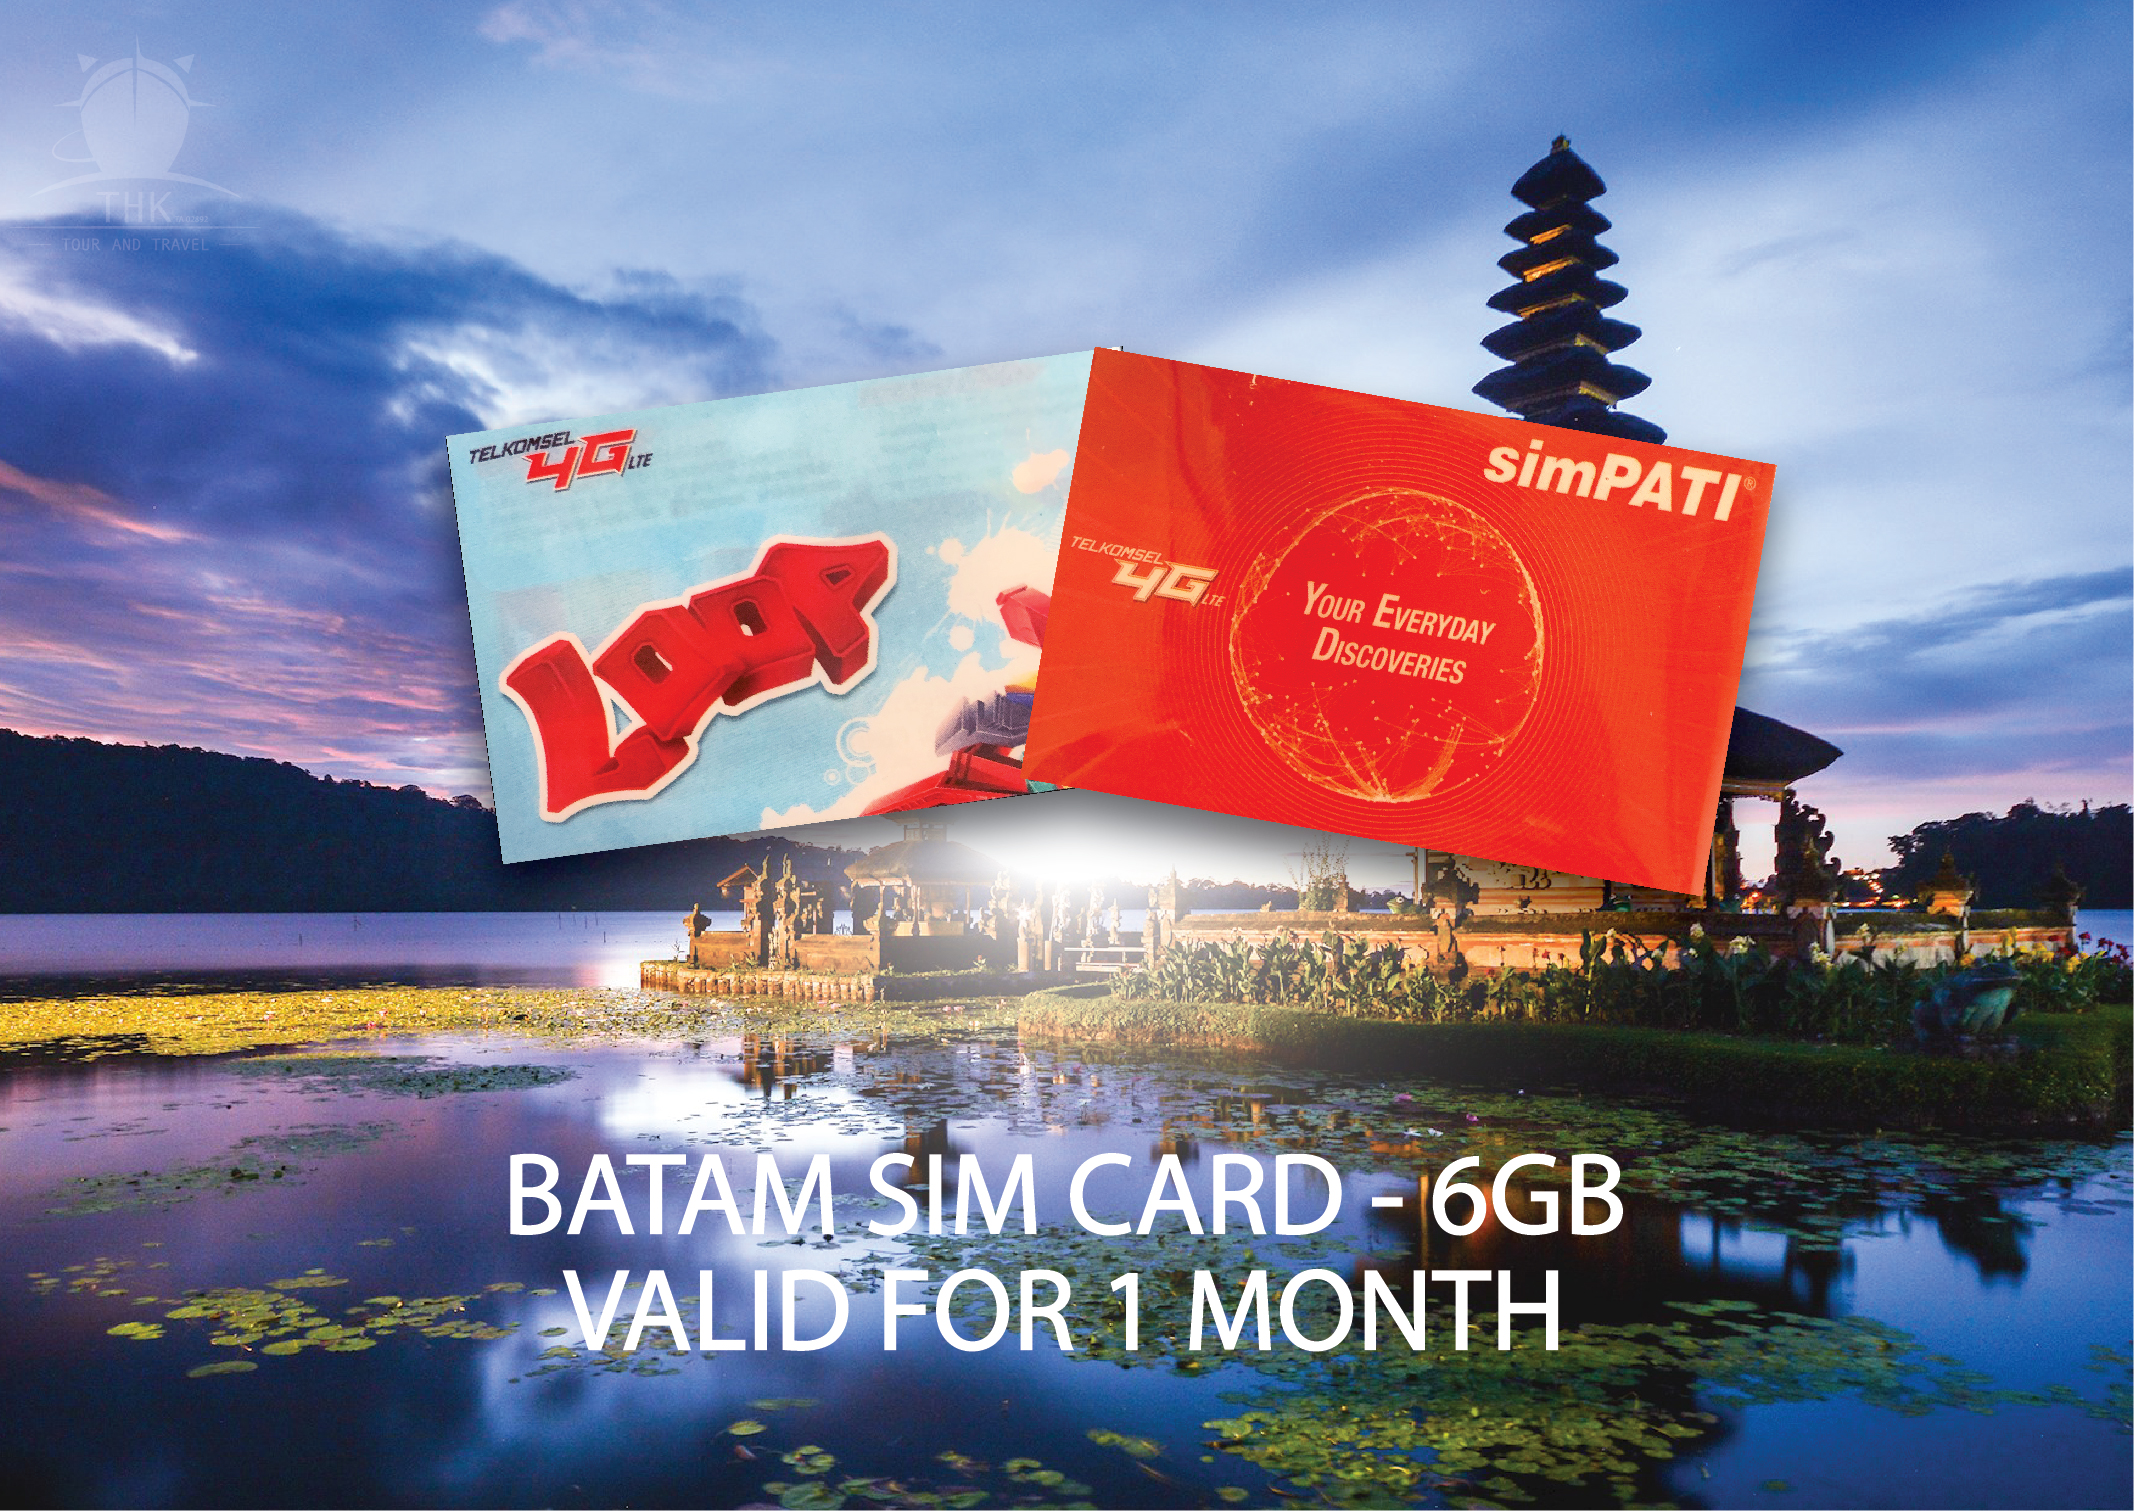 Batam Data Sim Card for Mobile Phone